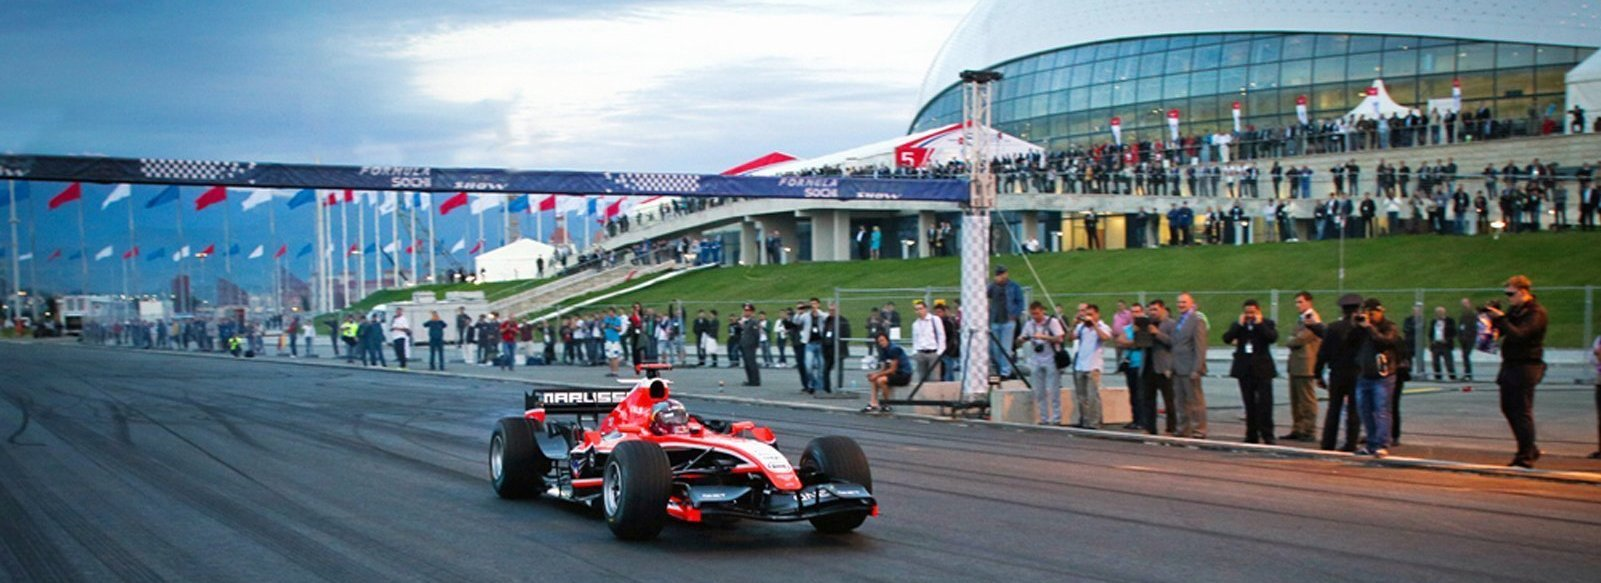 Формула 1 снова в Сочи!